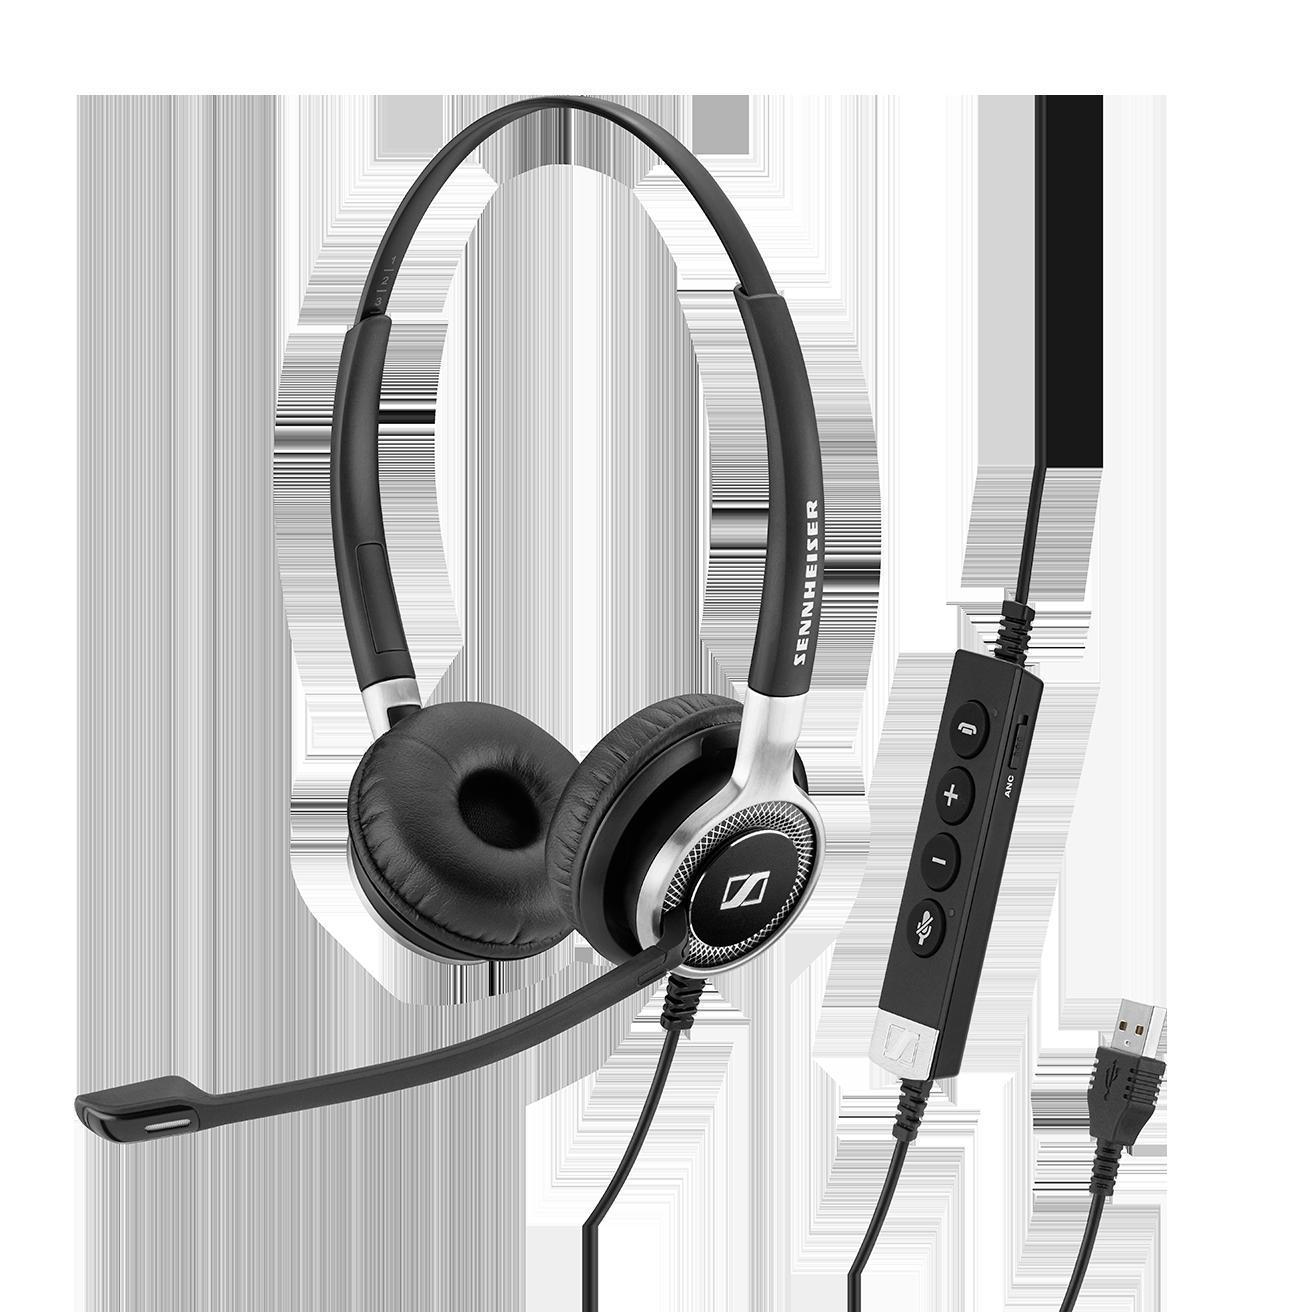 Sennheiser Century™ SC 660 ANC USB Headset